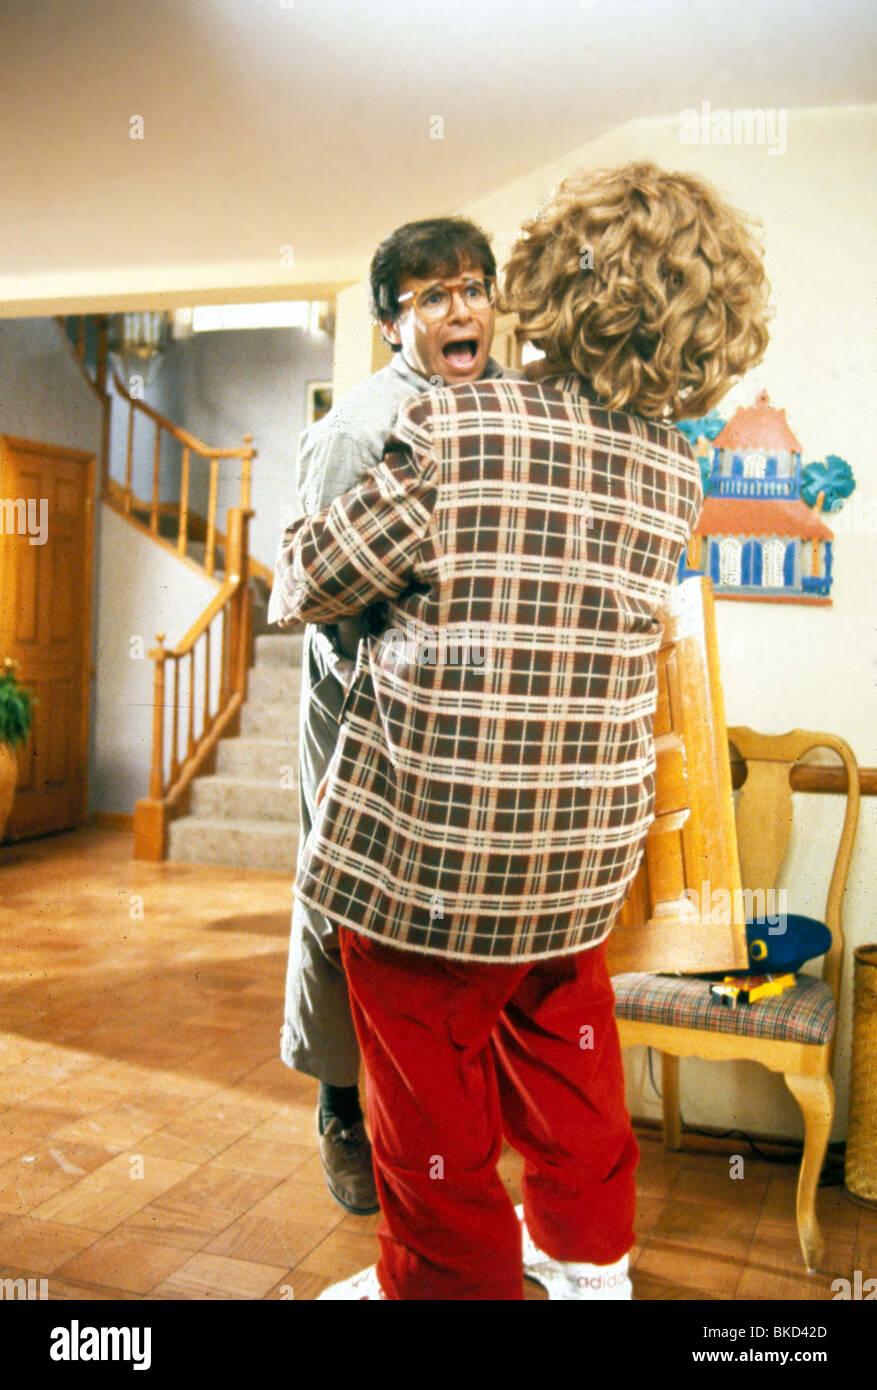 Buy Honey I Shrunk The Kids The Tv Show